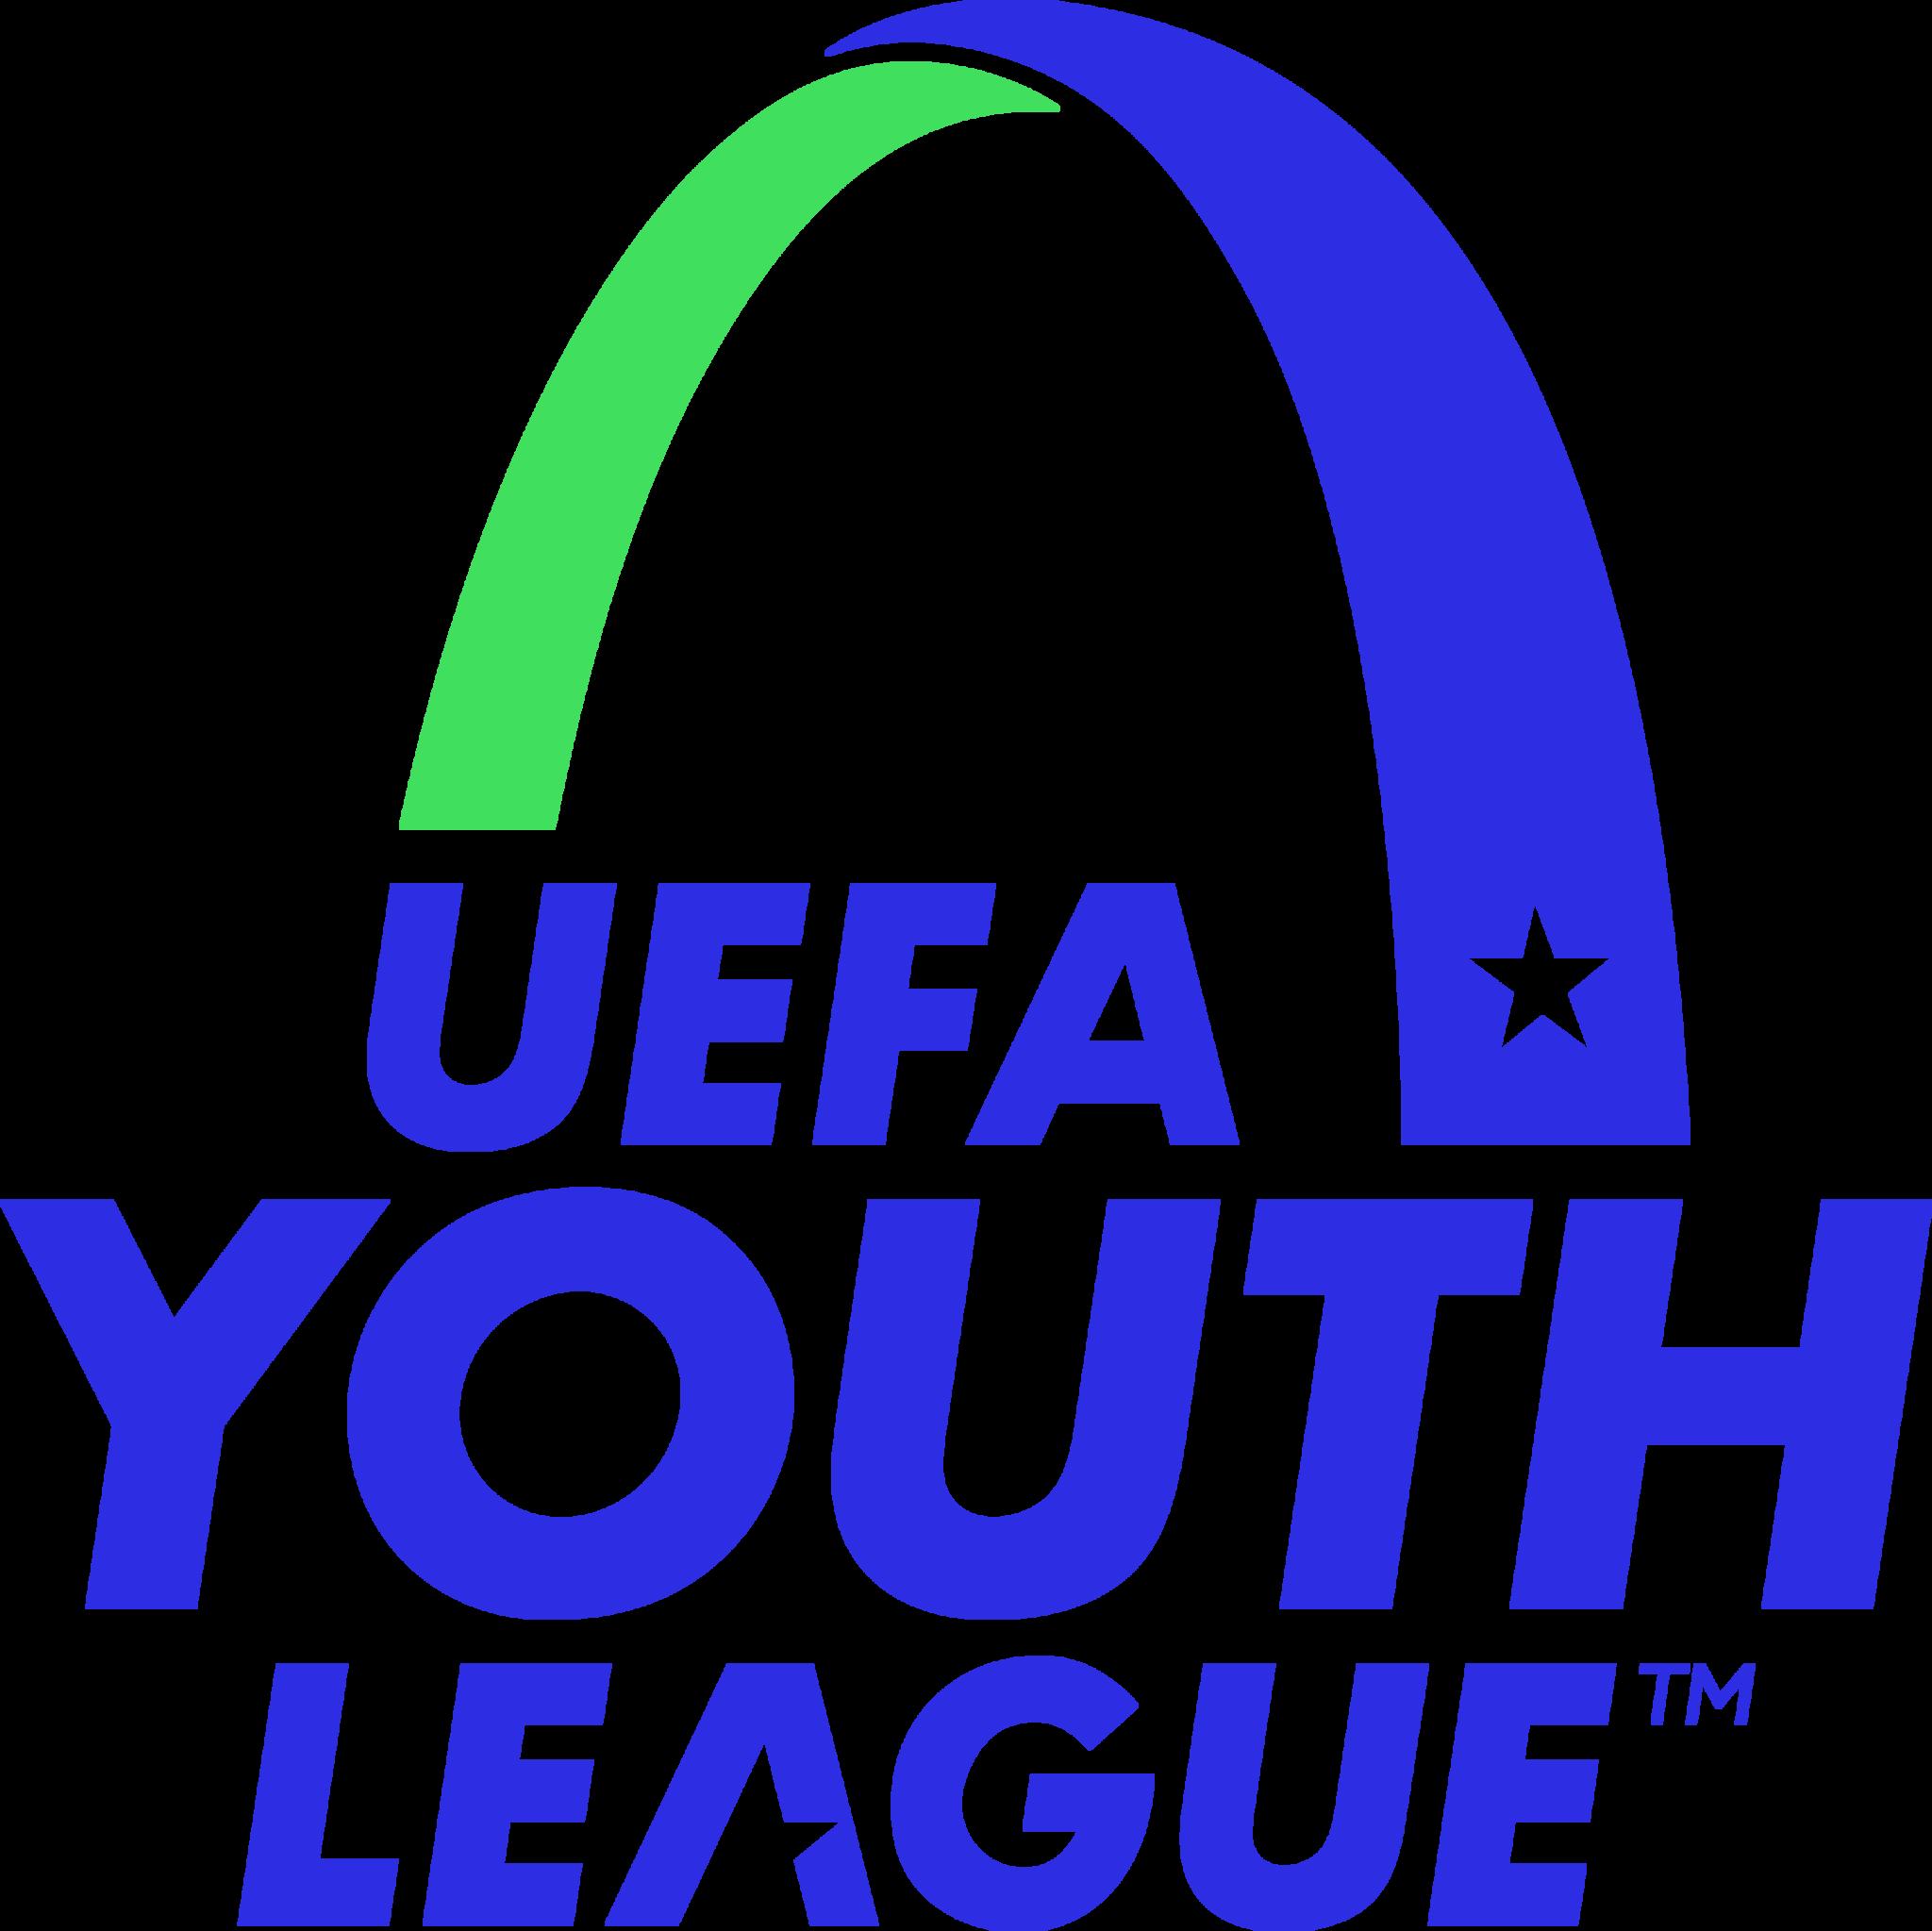 Uefa Logo 2013 Media downloads - Medi...